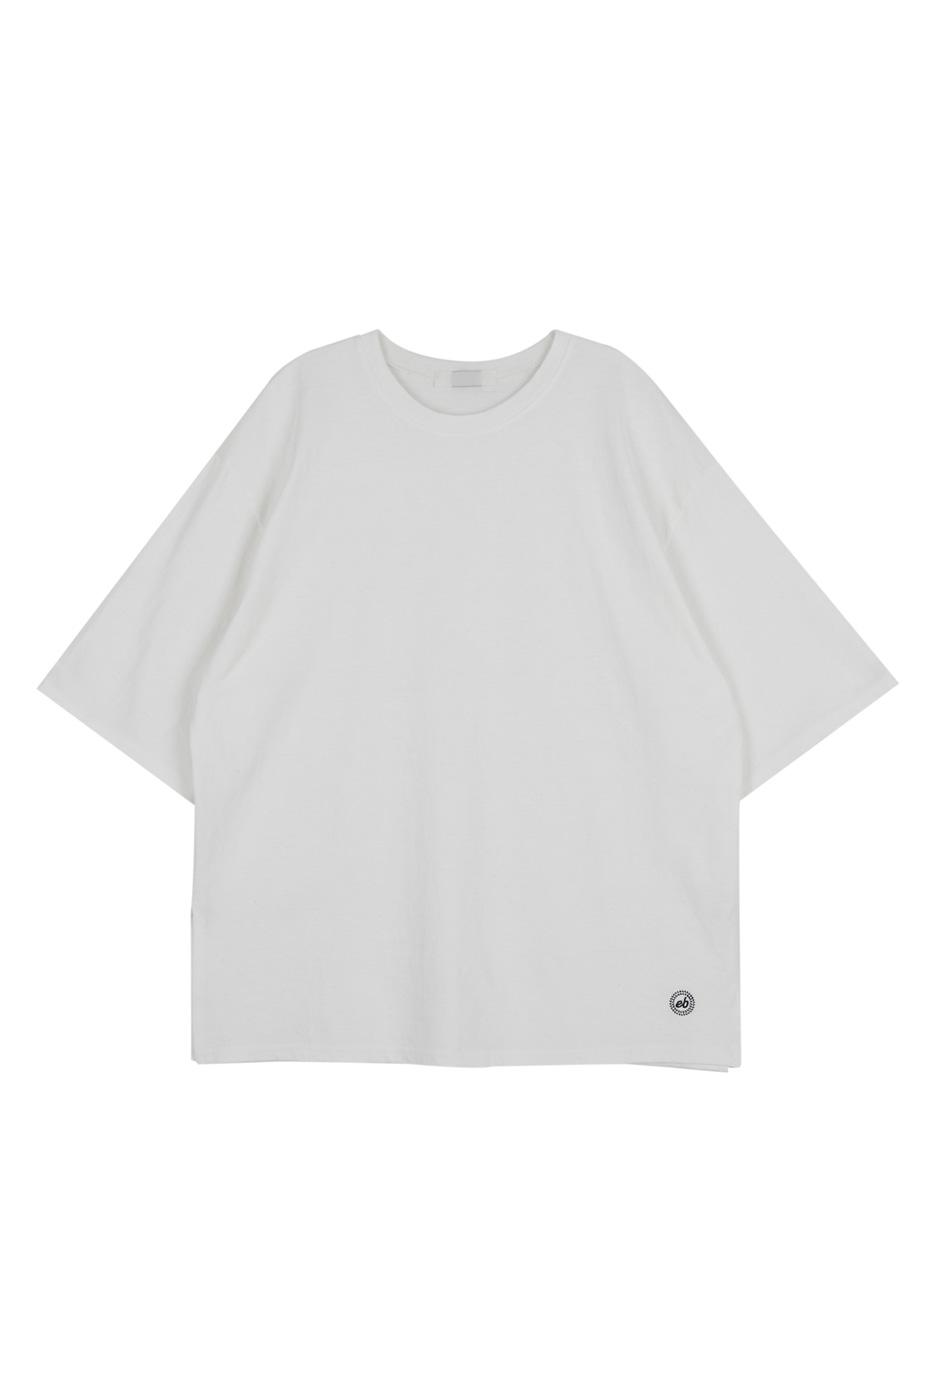 Edin over short sleeve T-shirt